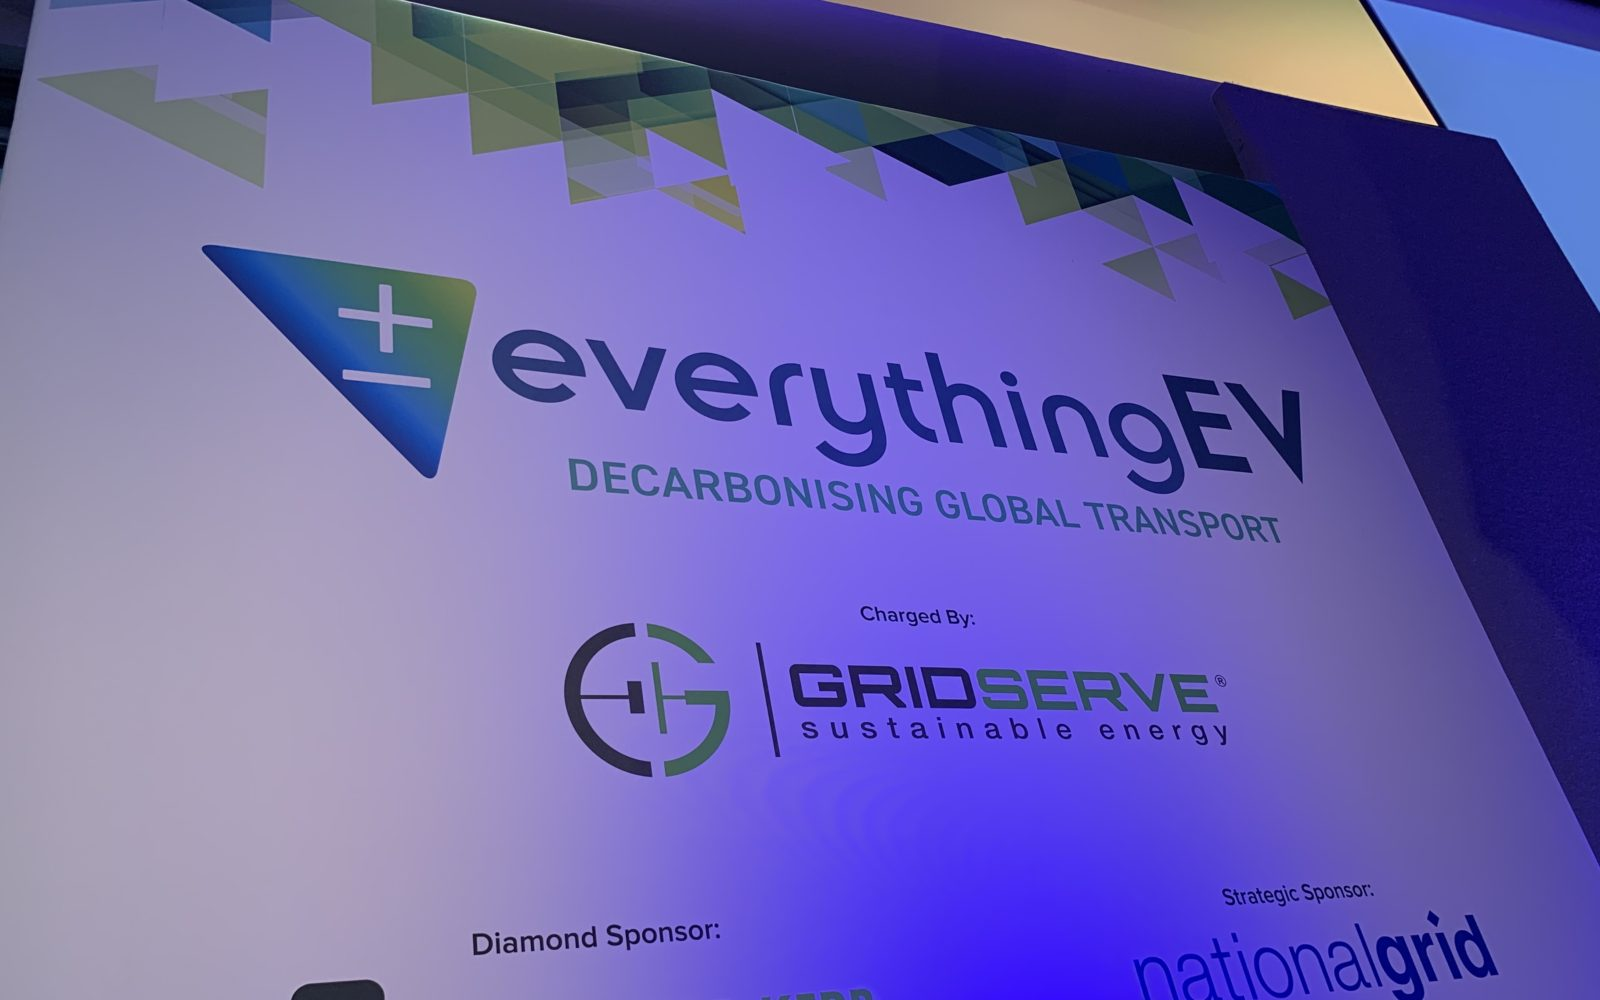 everything_ev.jpg